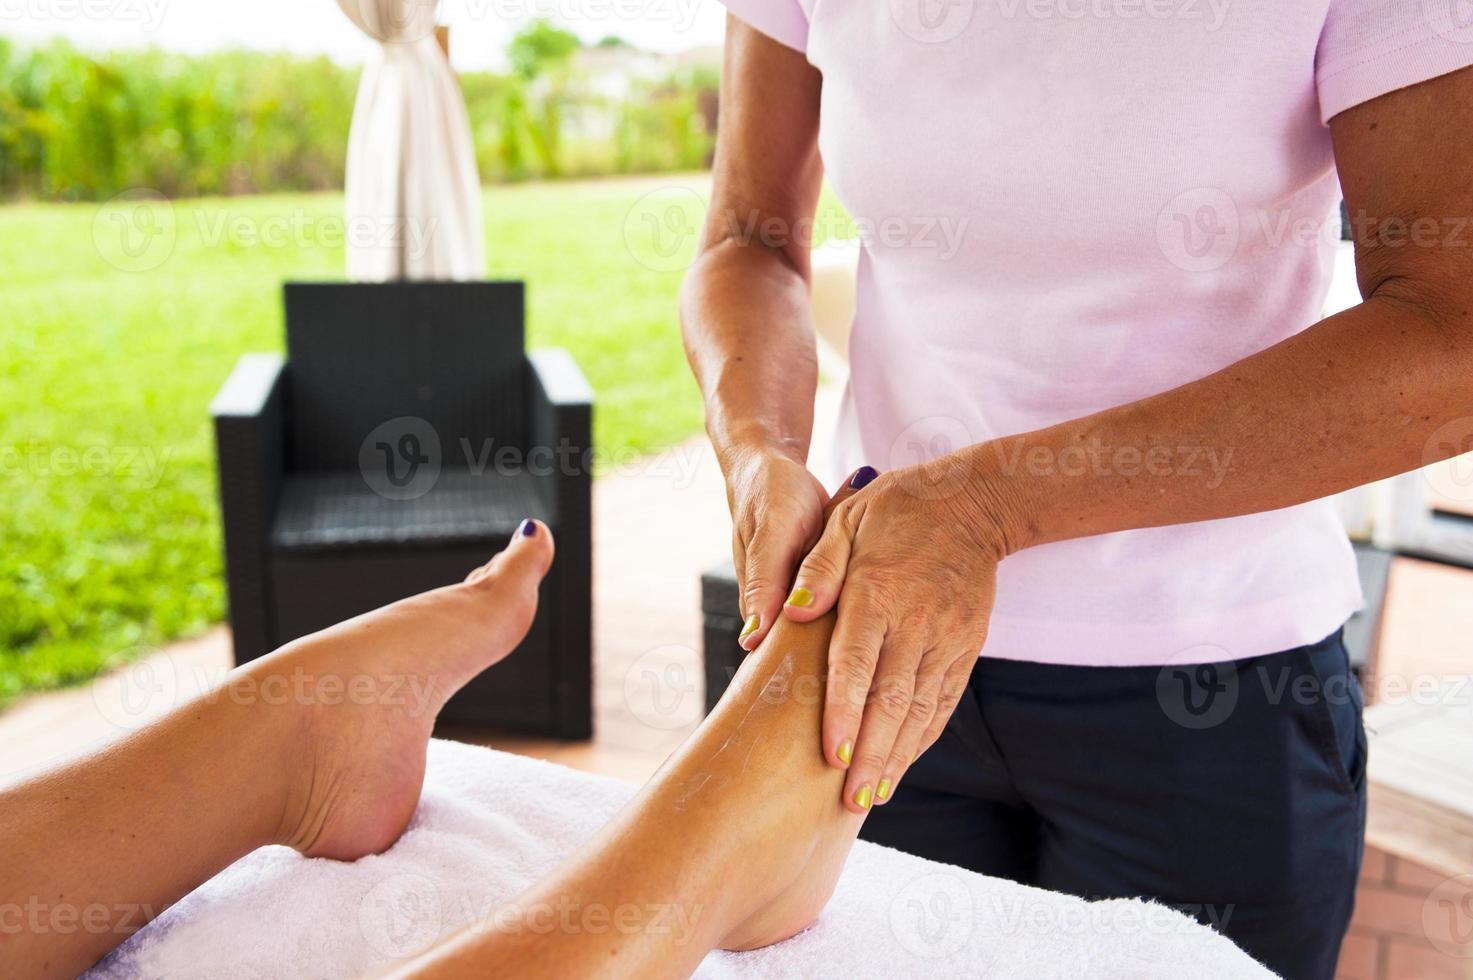 masajes de pies foto